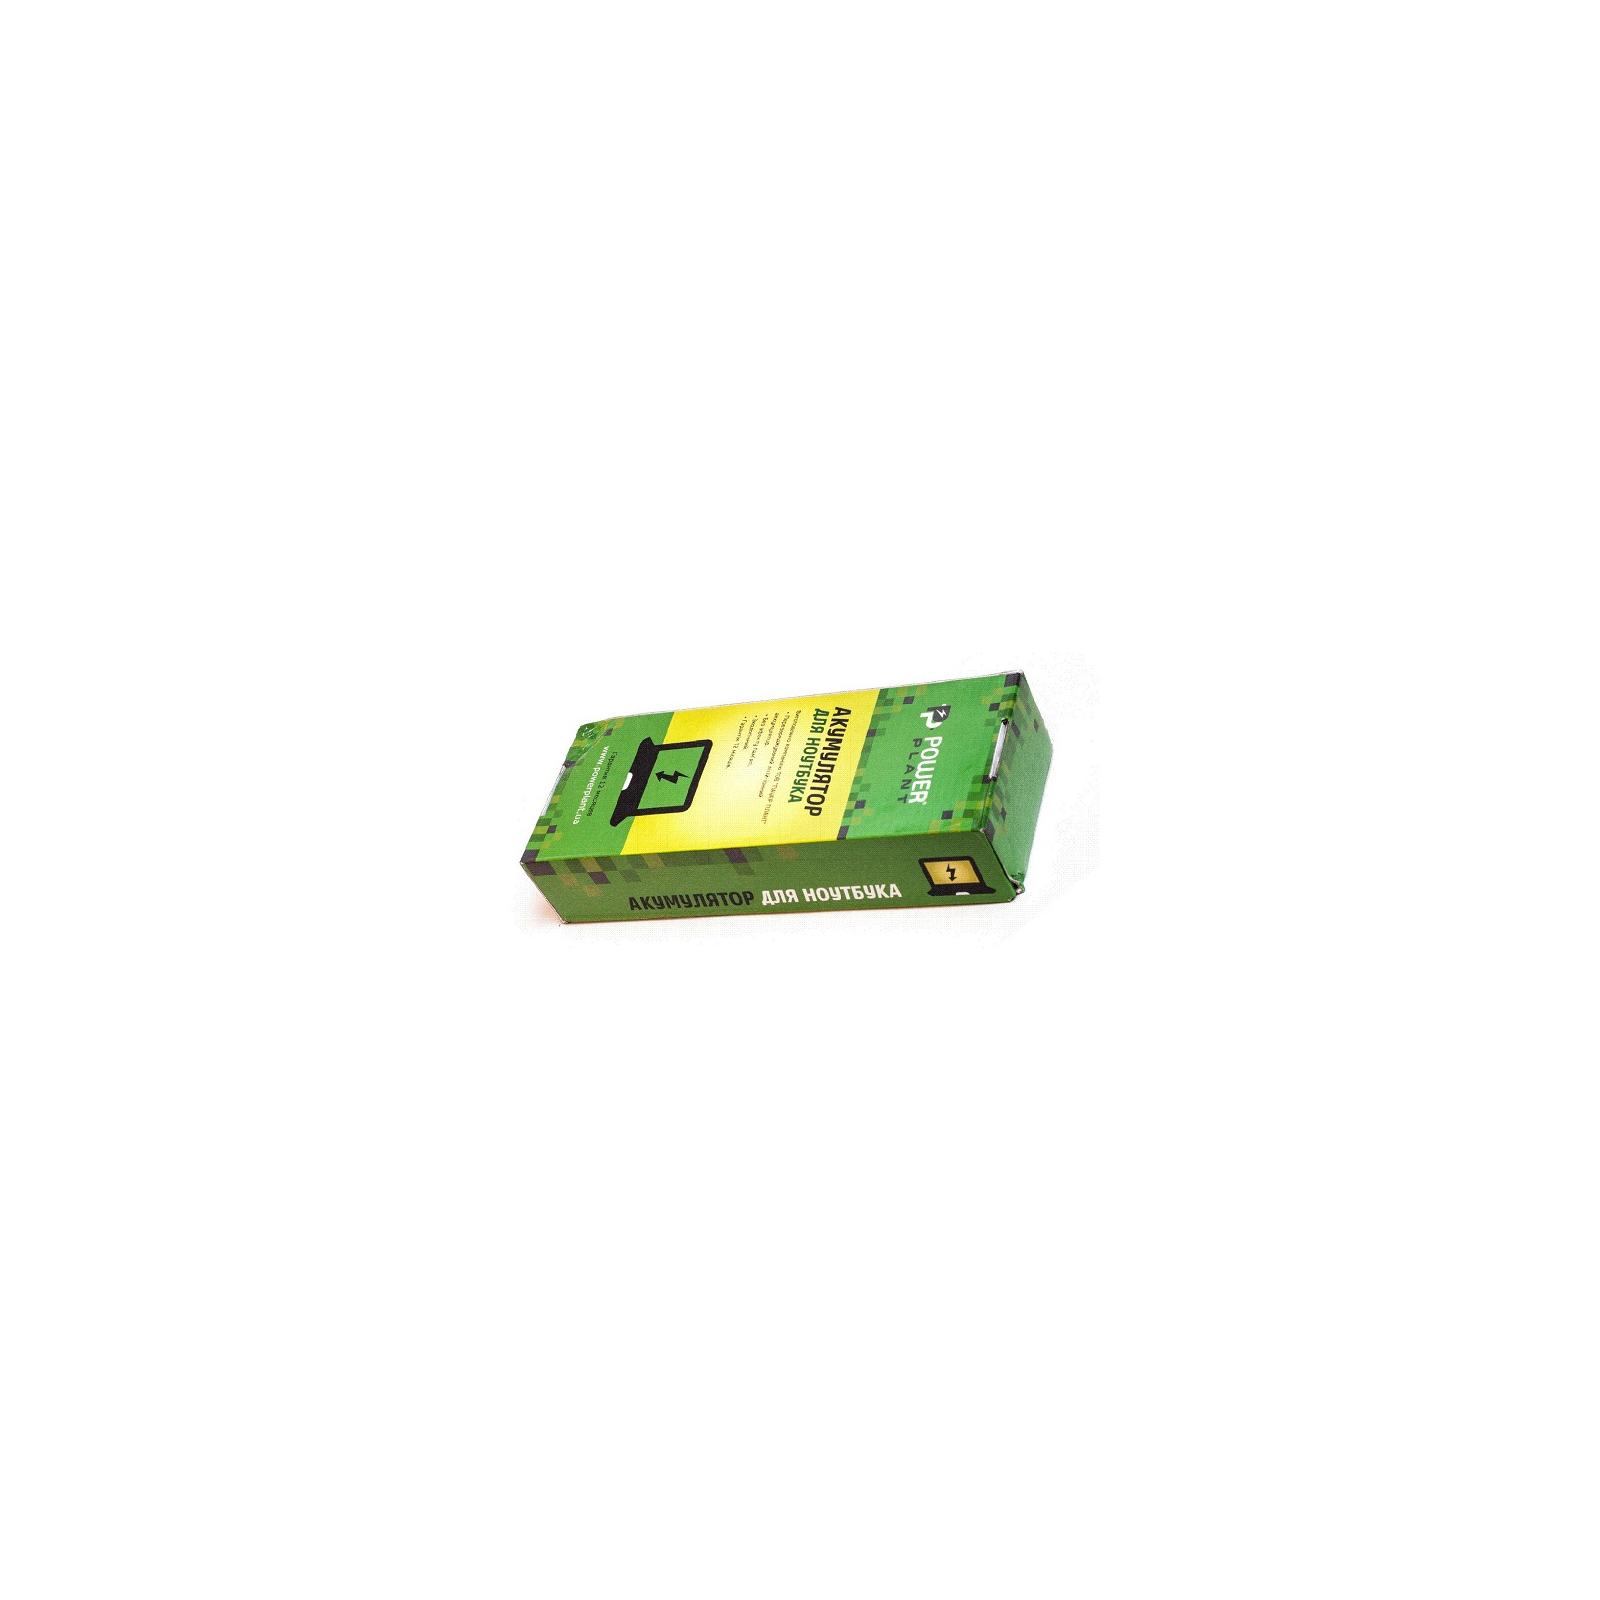 Аккумулятор для ноутбука HP DV7 (HSTNN-IB75) 14.4V 4400mAh PowerPlant (NB00000192) изображение 3